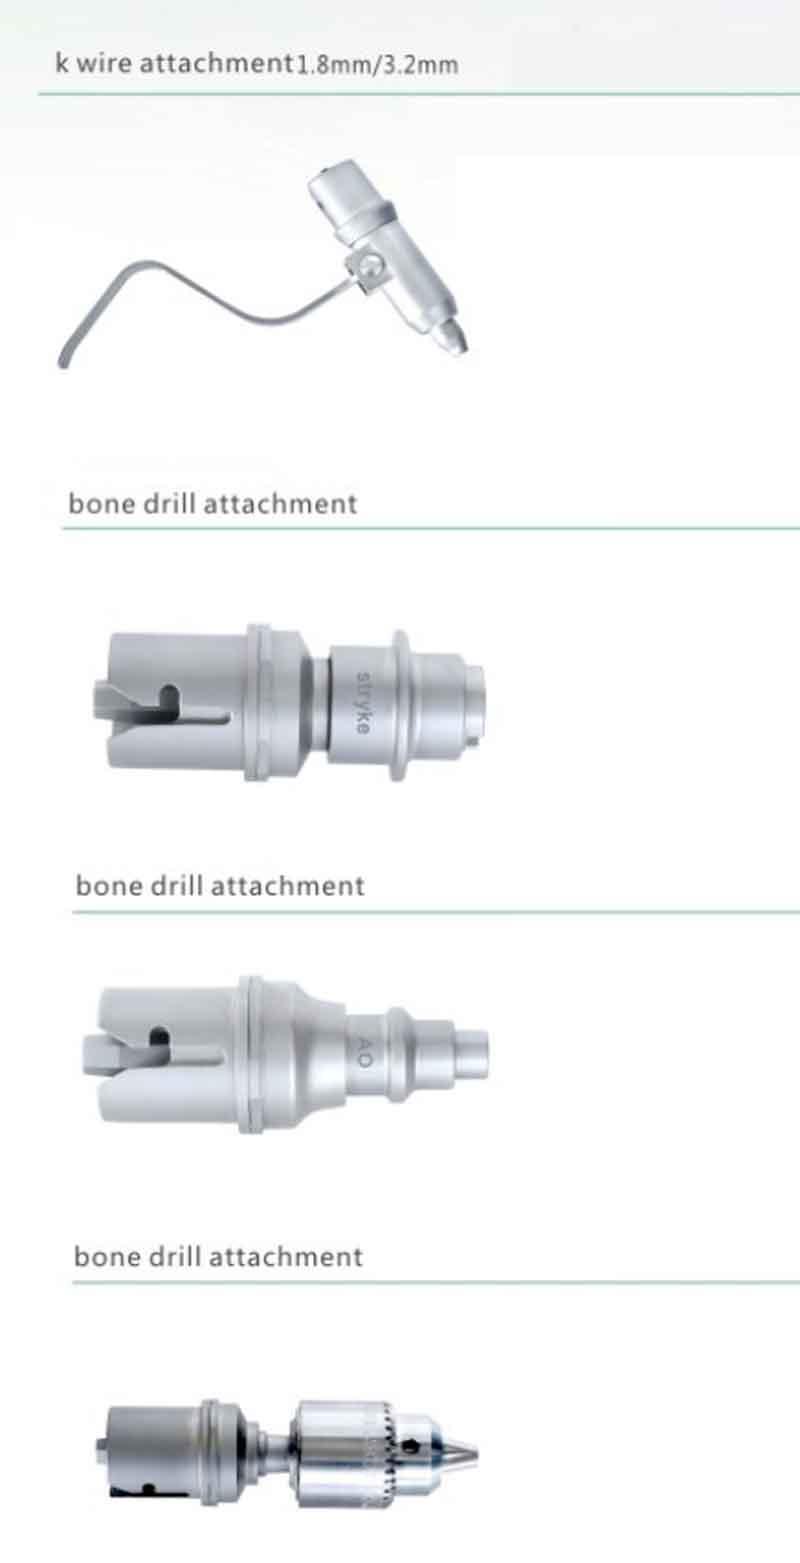 E Series MultiFunctional System Orthopedic power tools